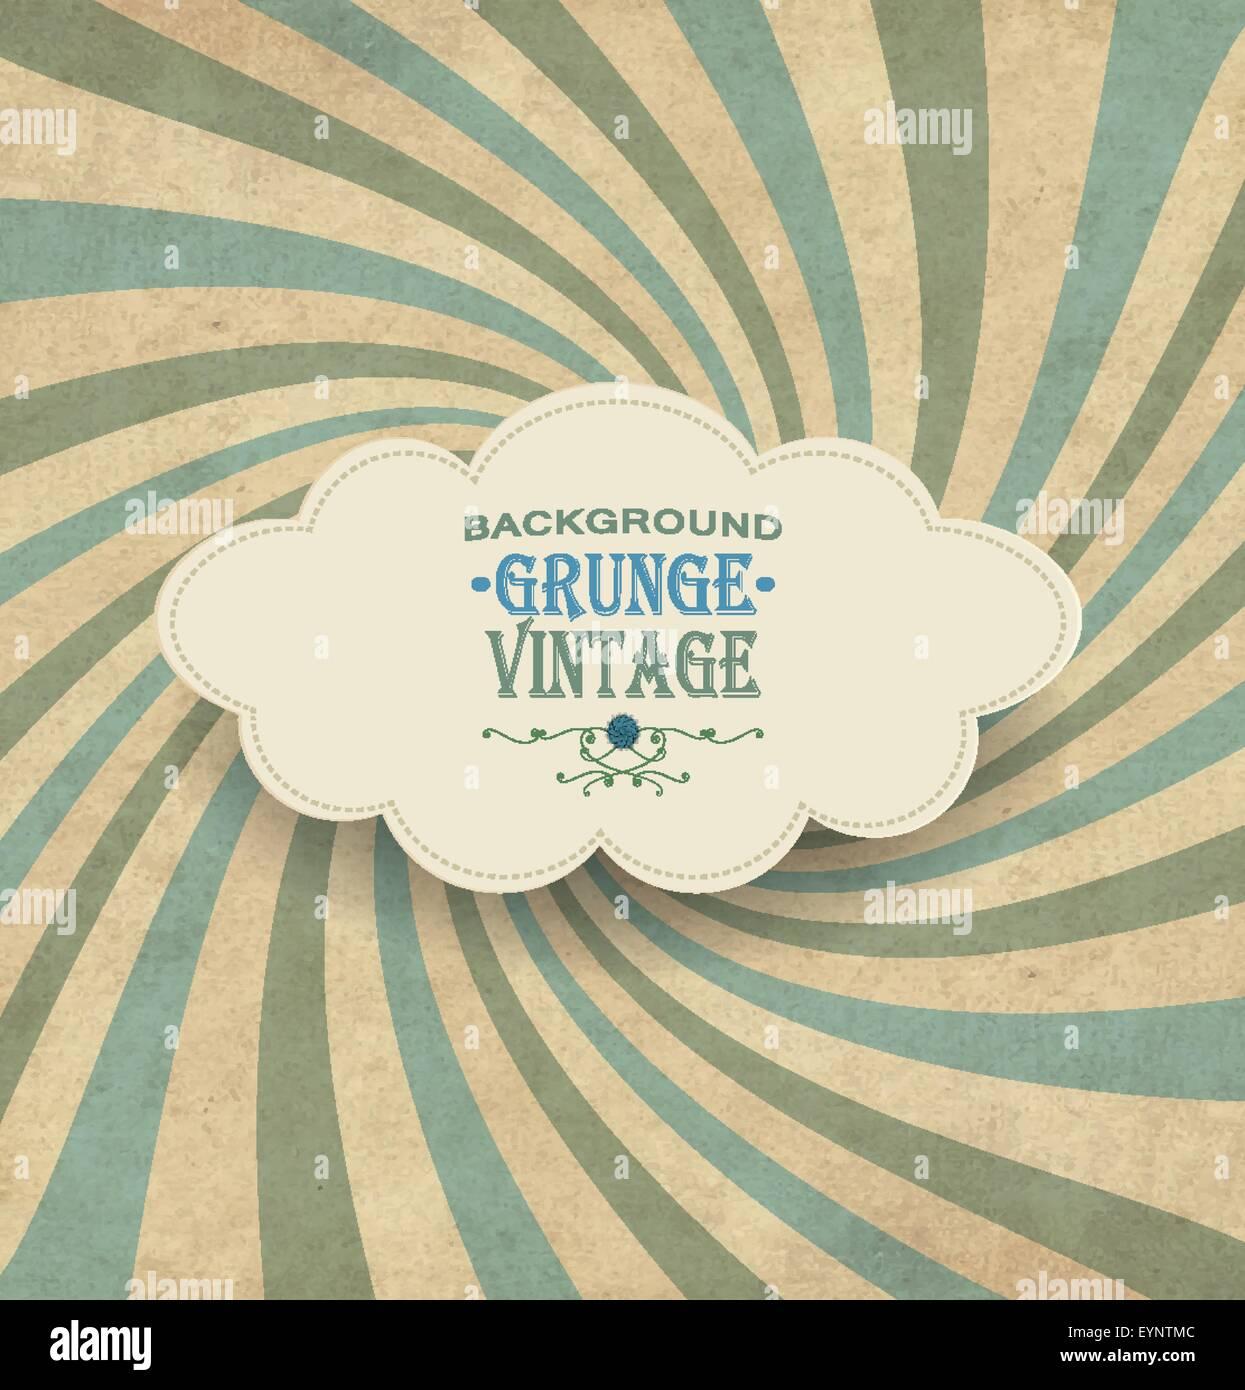 Vintage Frame With Grunge Radiant Background And Title Inscription - Stock Image